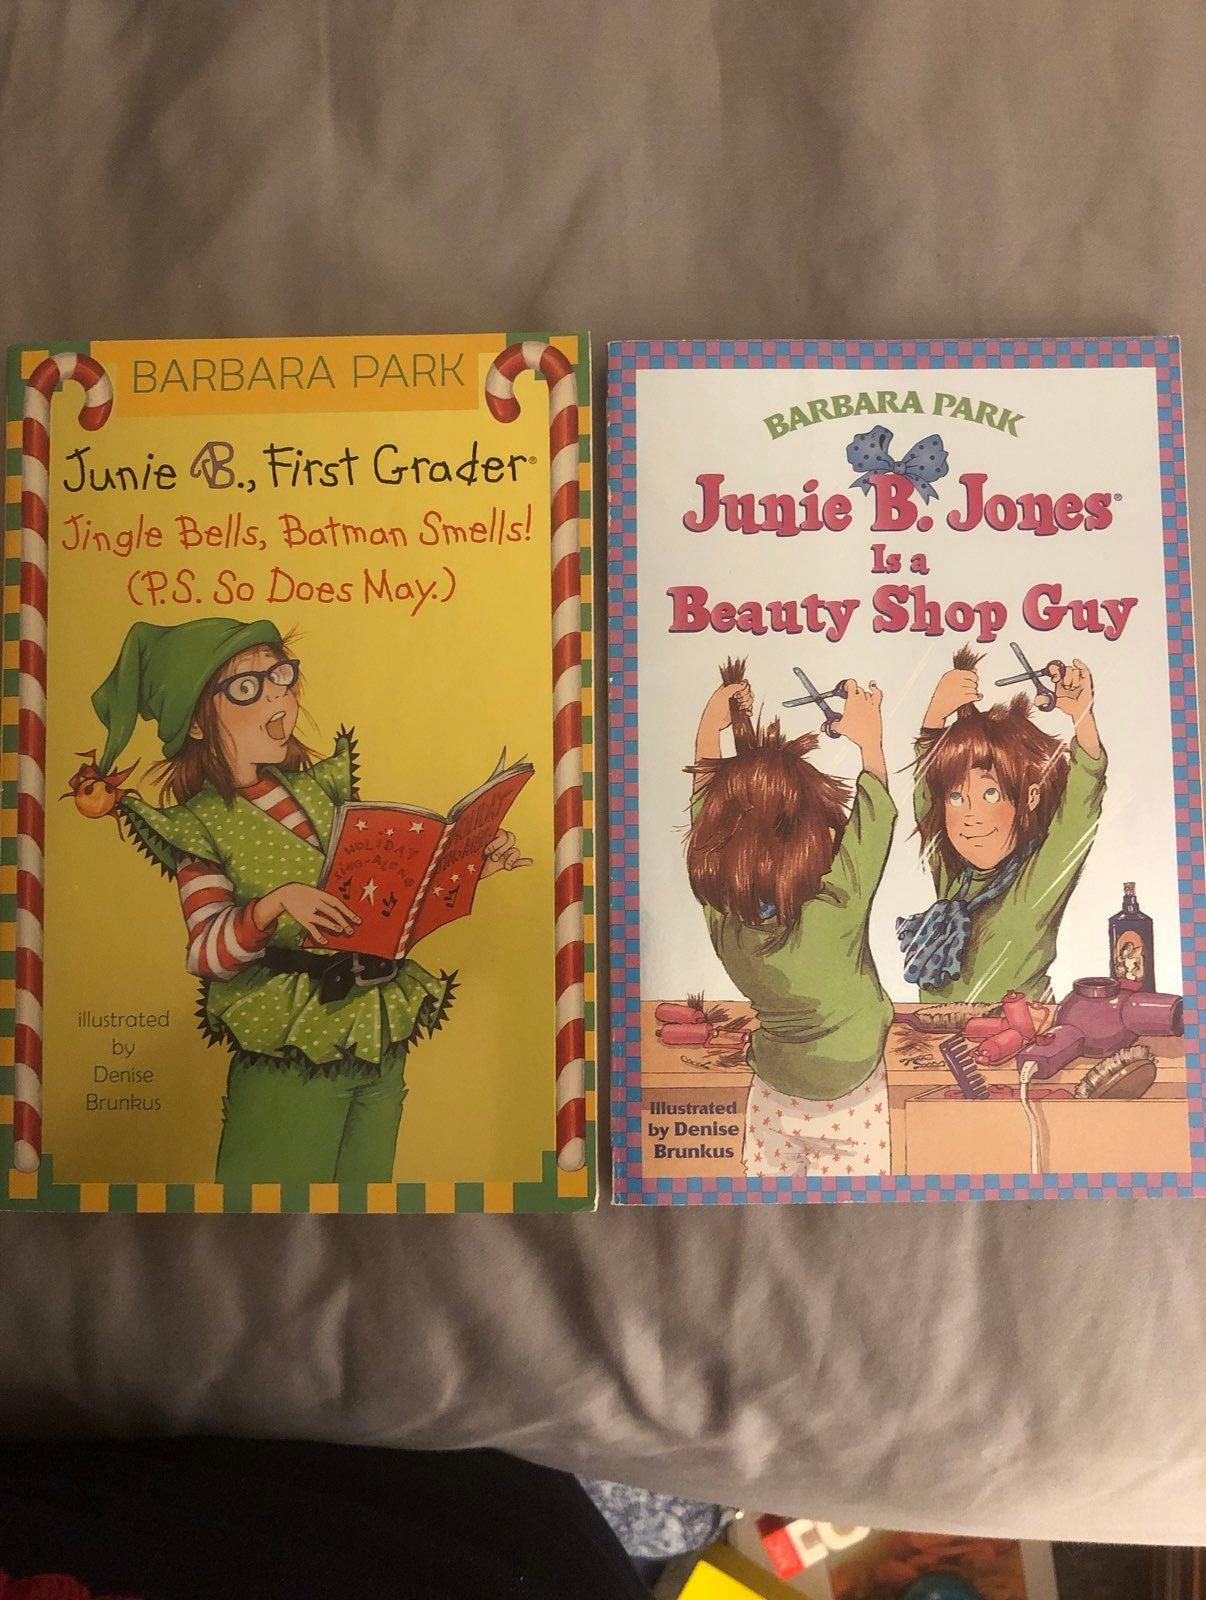 Junie B Jones books